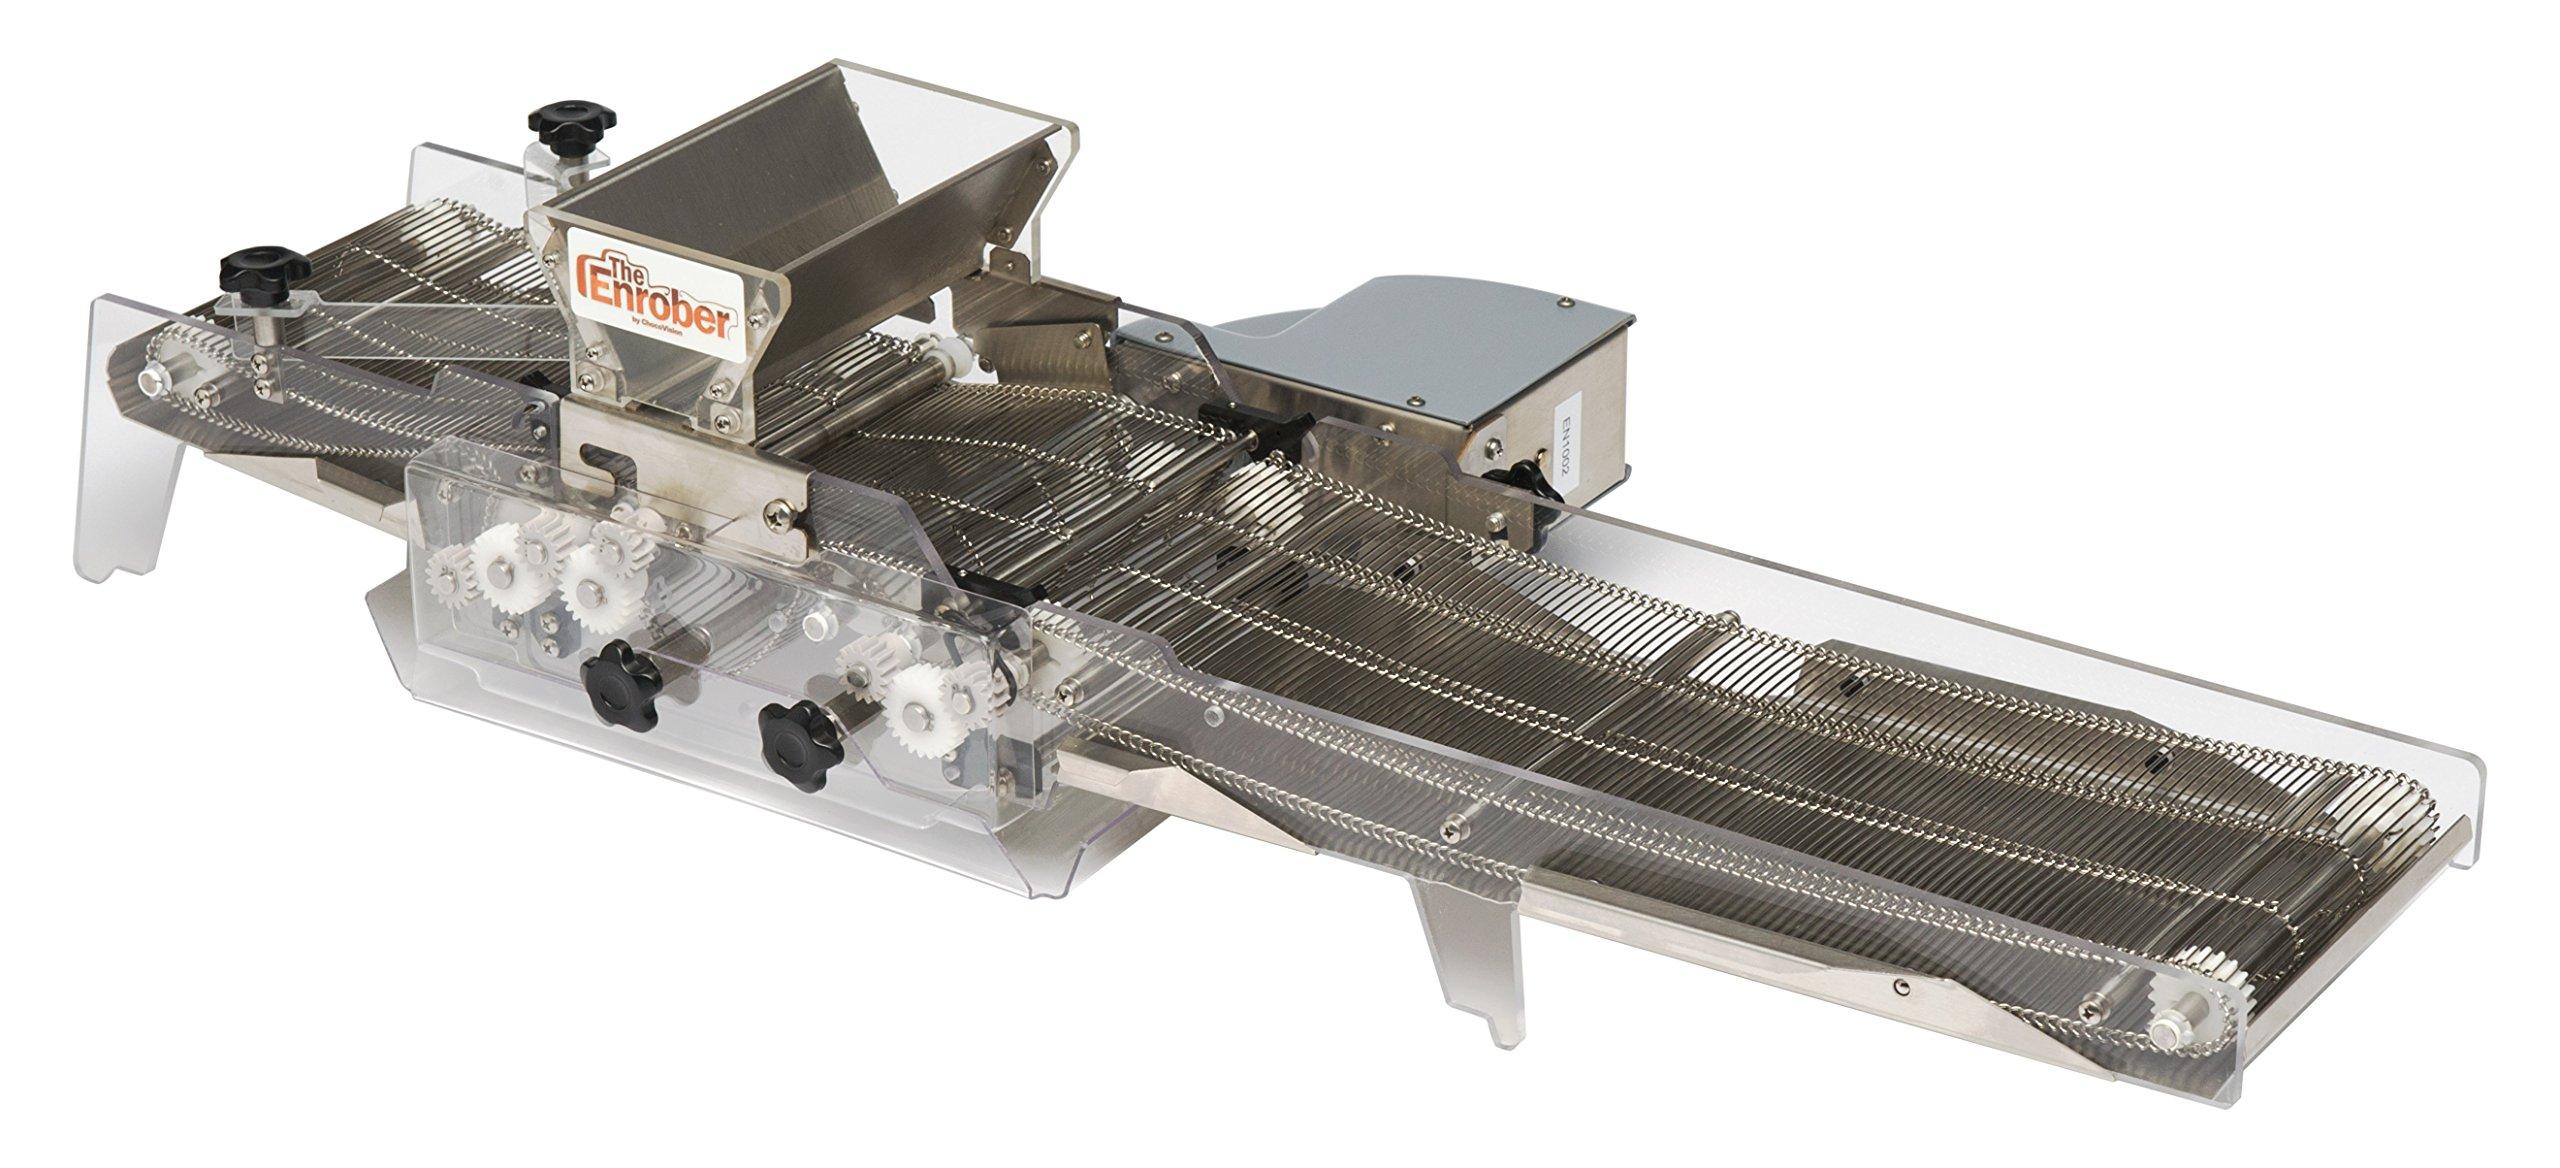 ChocoVision Belt Extension for Enrober (Revolation 3Z, Skimmer and Enrober Required)